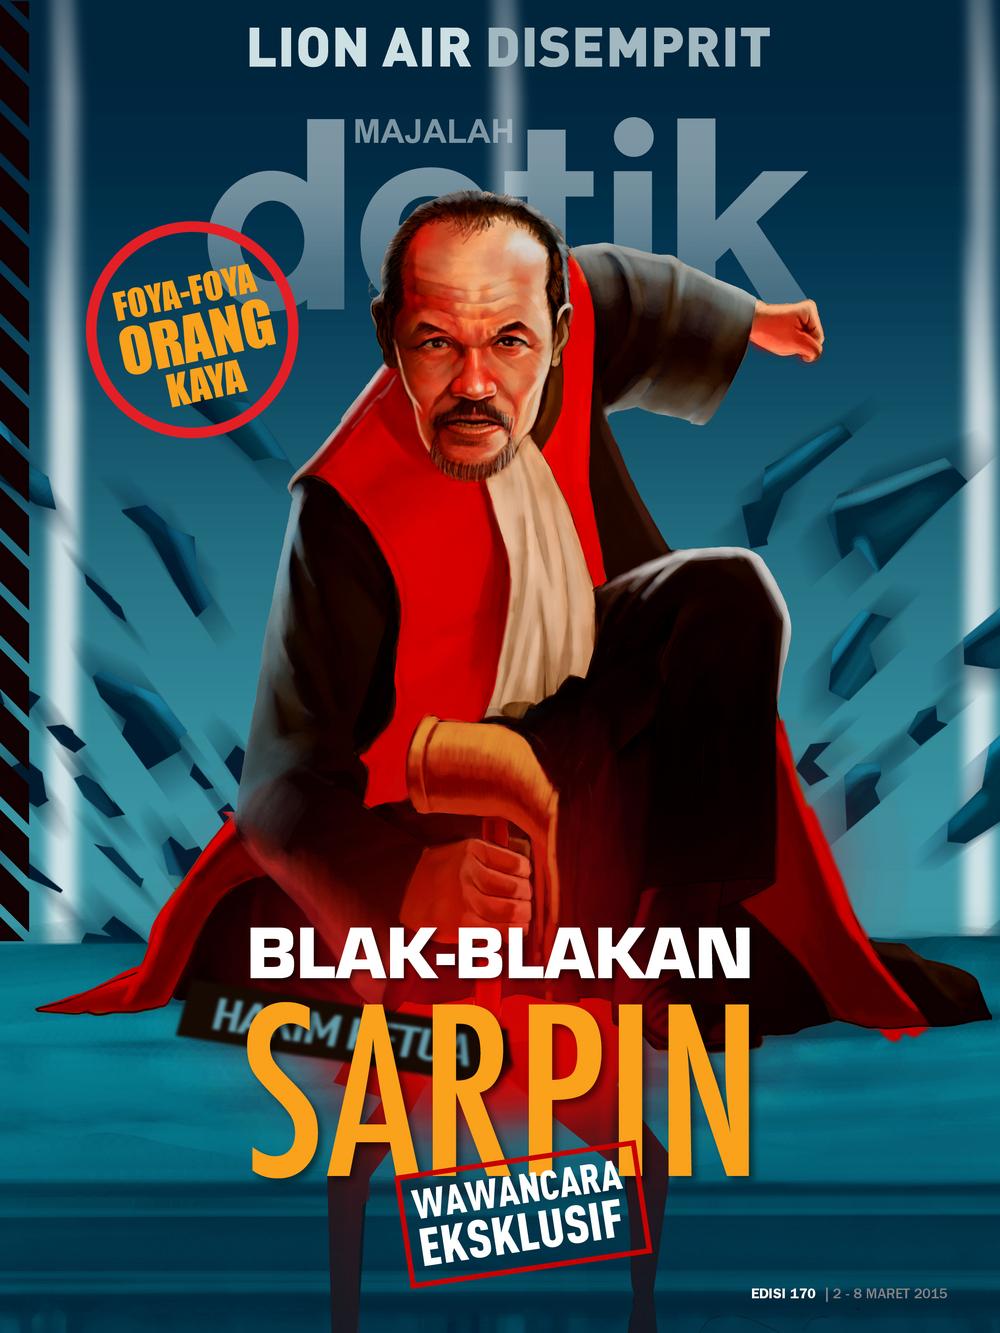 Blak-blakan Sarpin